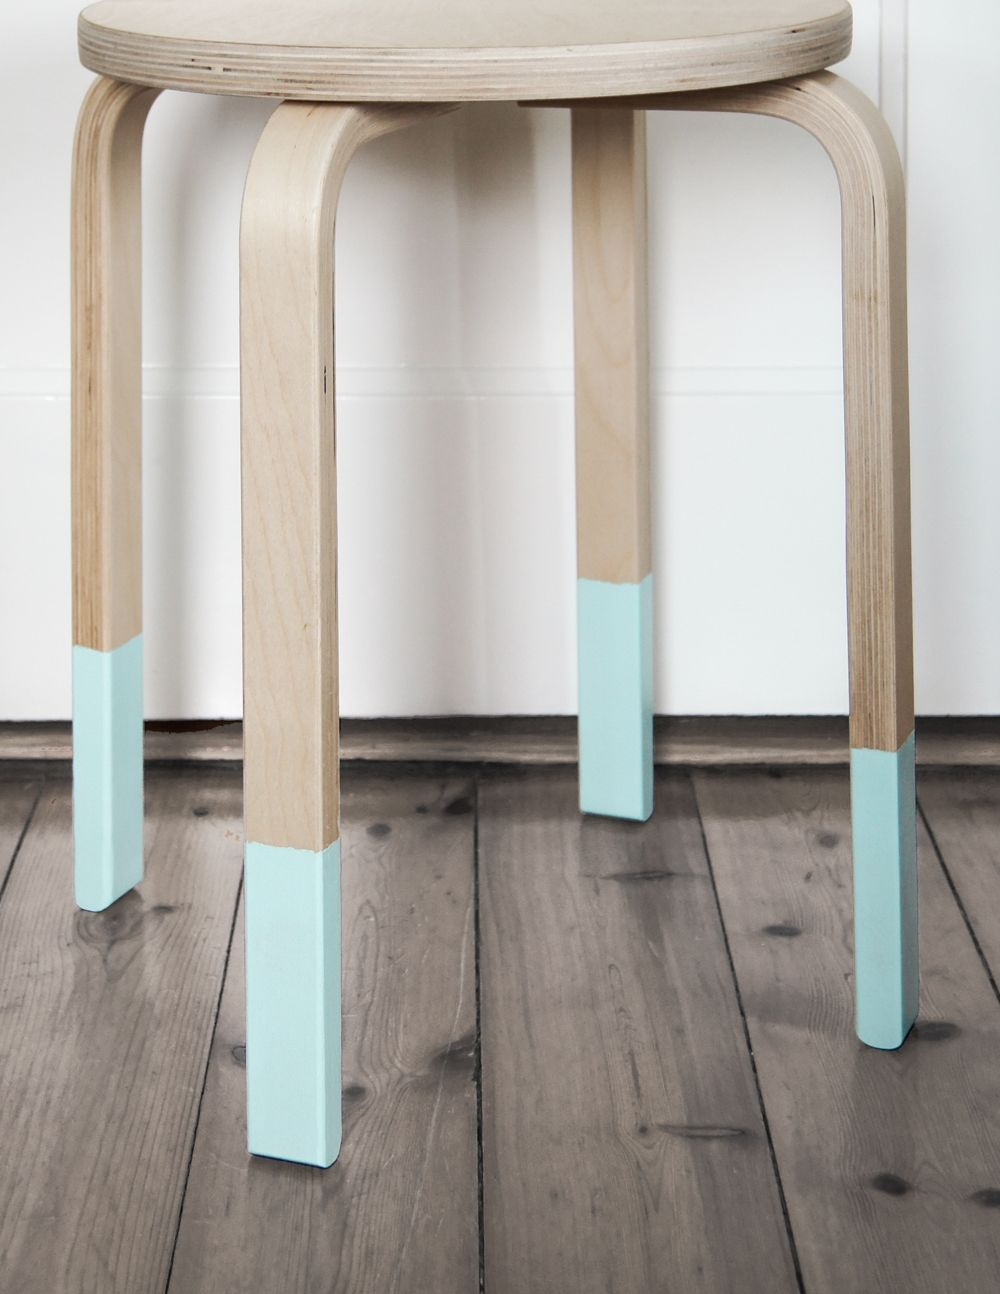 Pastell Holz Hocker Upcycling In Mint Ikea Pinterest Shabby